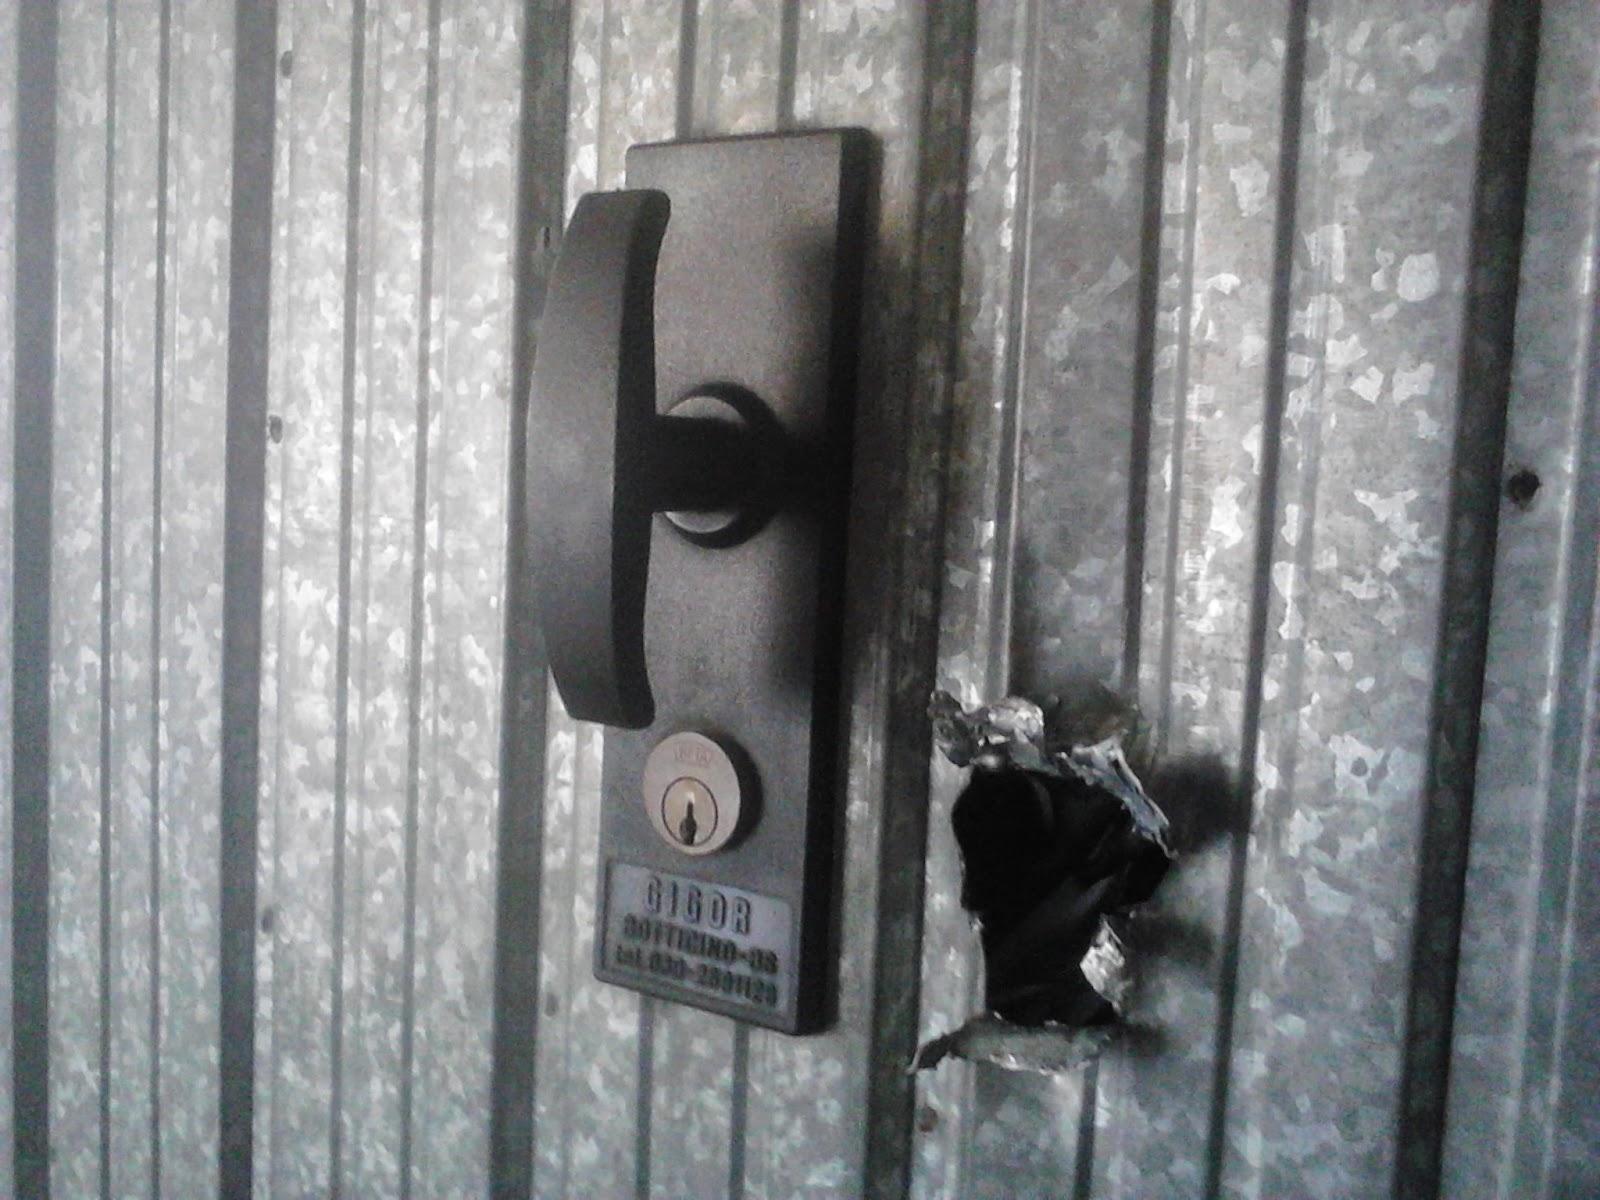 vendita-online-serrature-sicurezza-basculanti-serrande